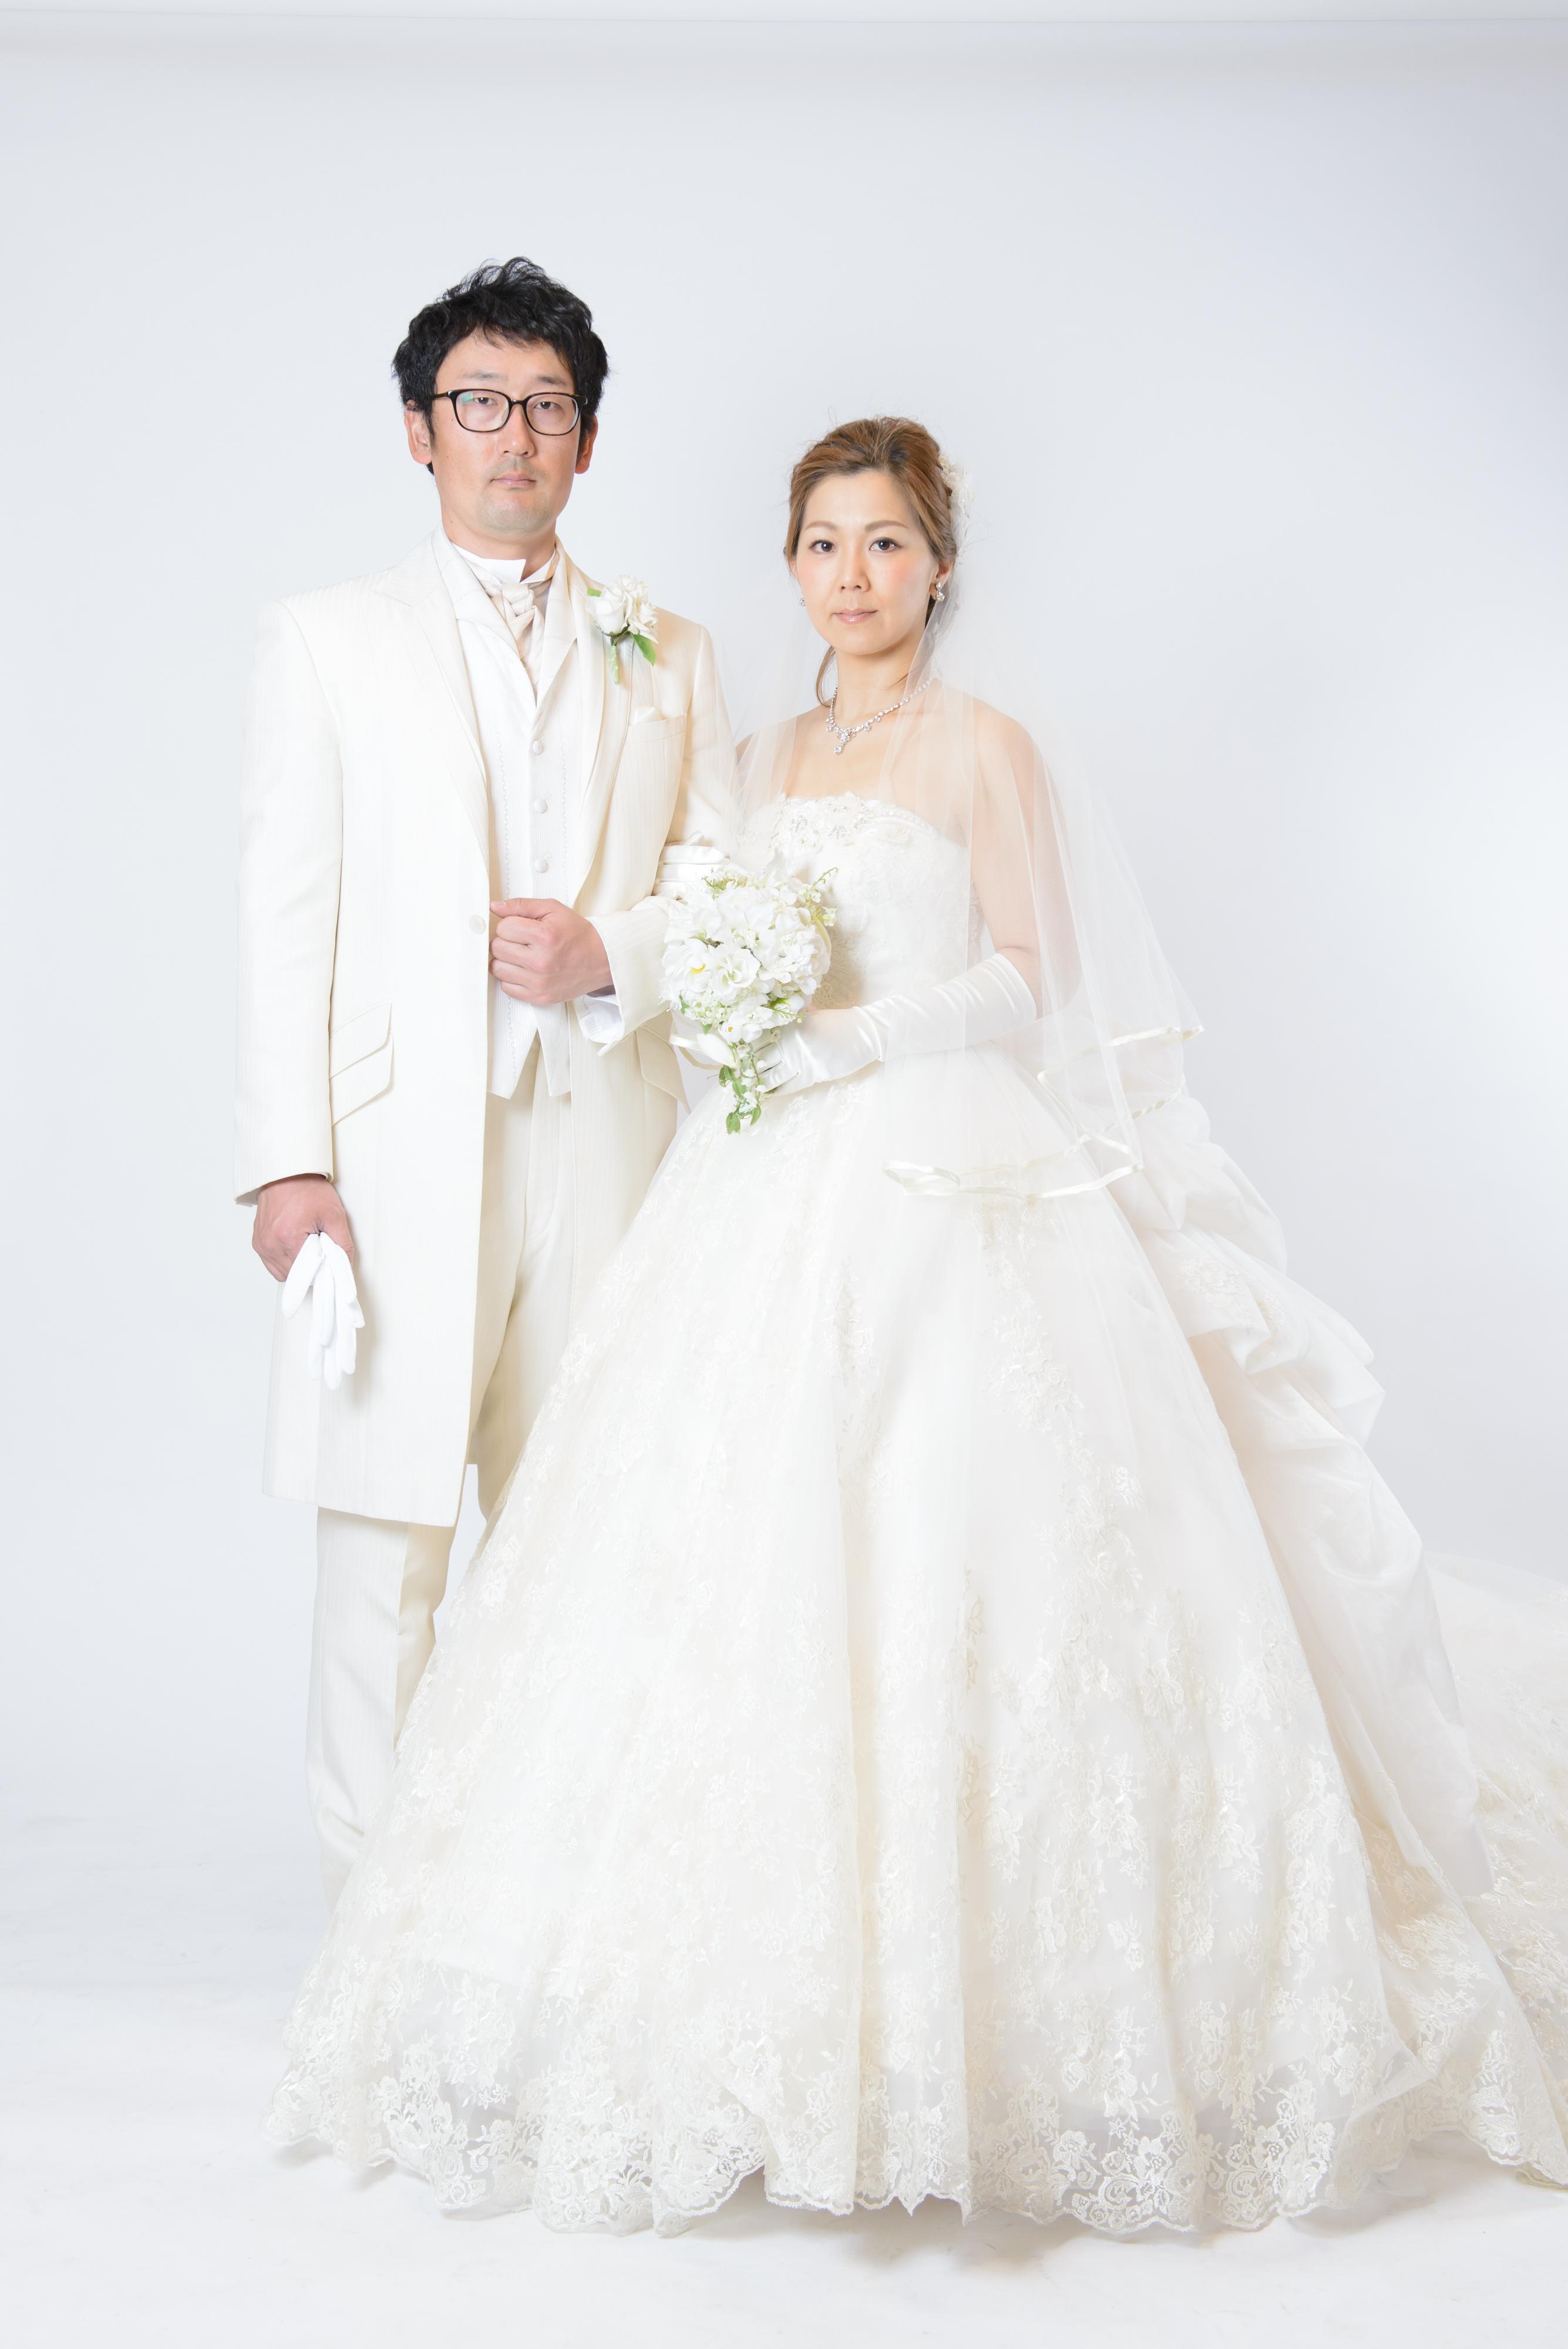 9fc49286ca00f 3.スタジオ写真、スタジオスナップ写真、前撮り記念写真説明 4.ロケーション&スタジオの解説 5.結婚式当日、おいかけスナップ撮影